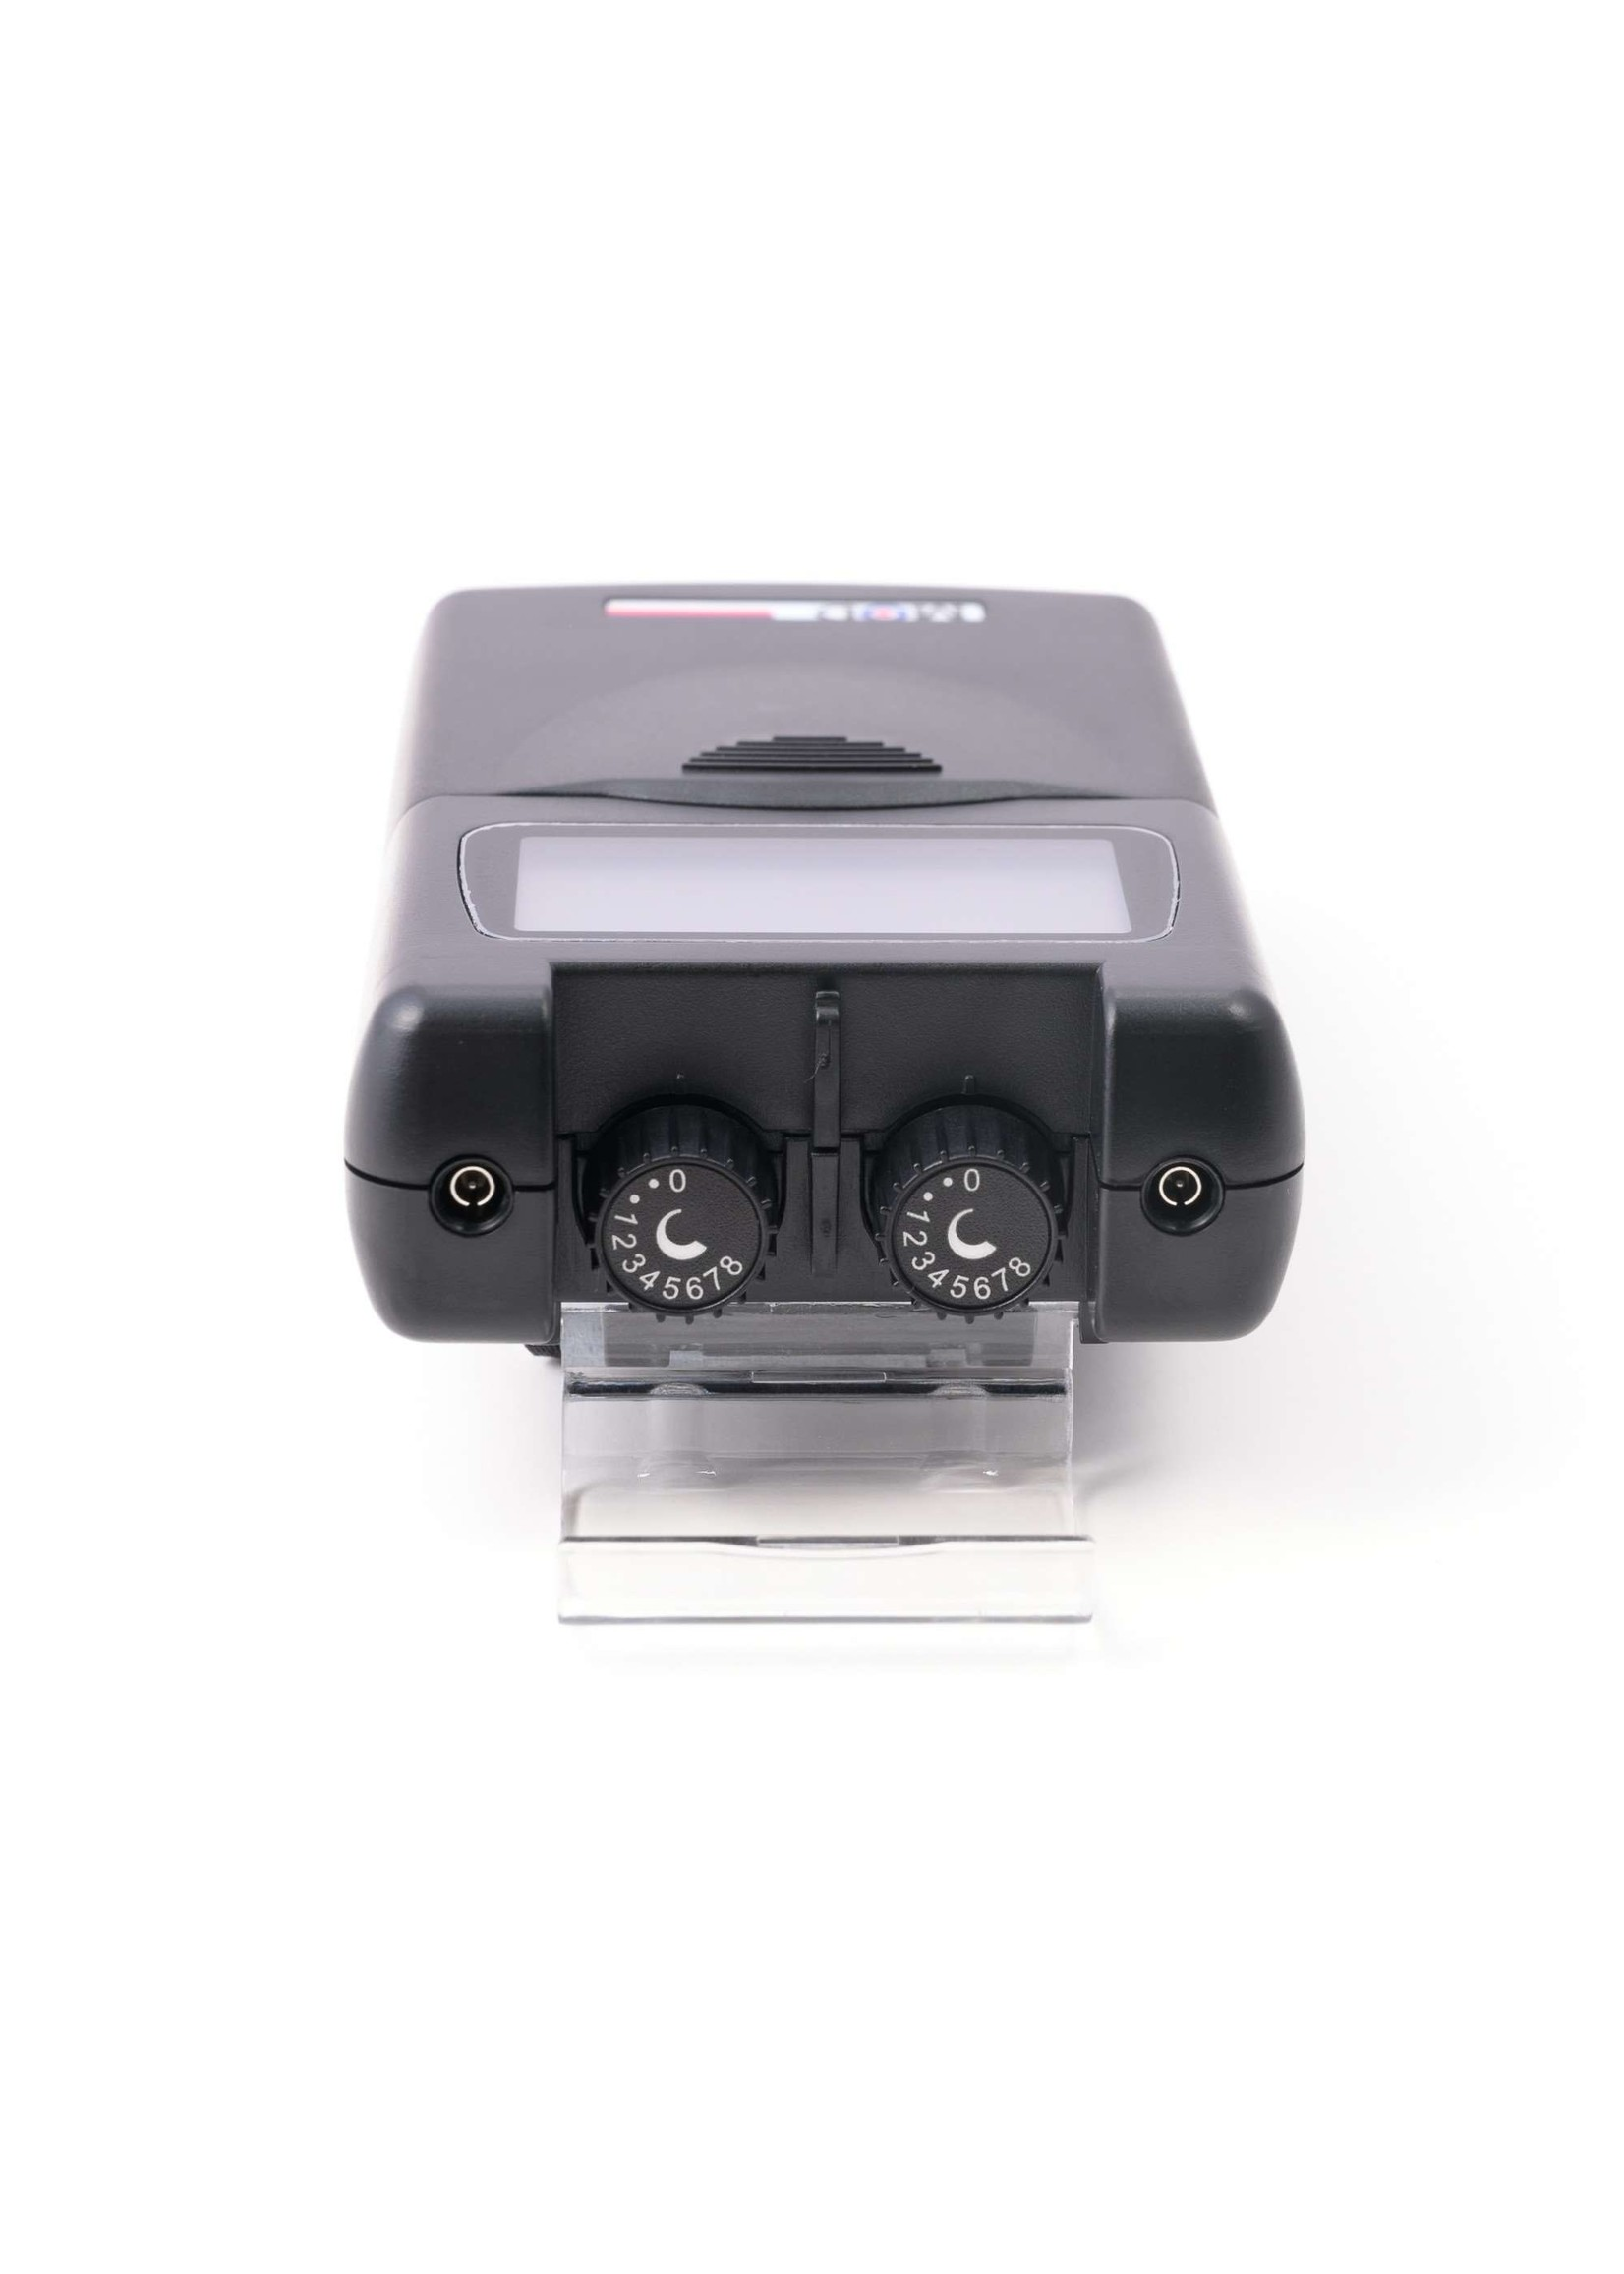 MOD MOD E/S Control Box